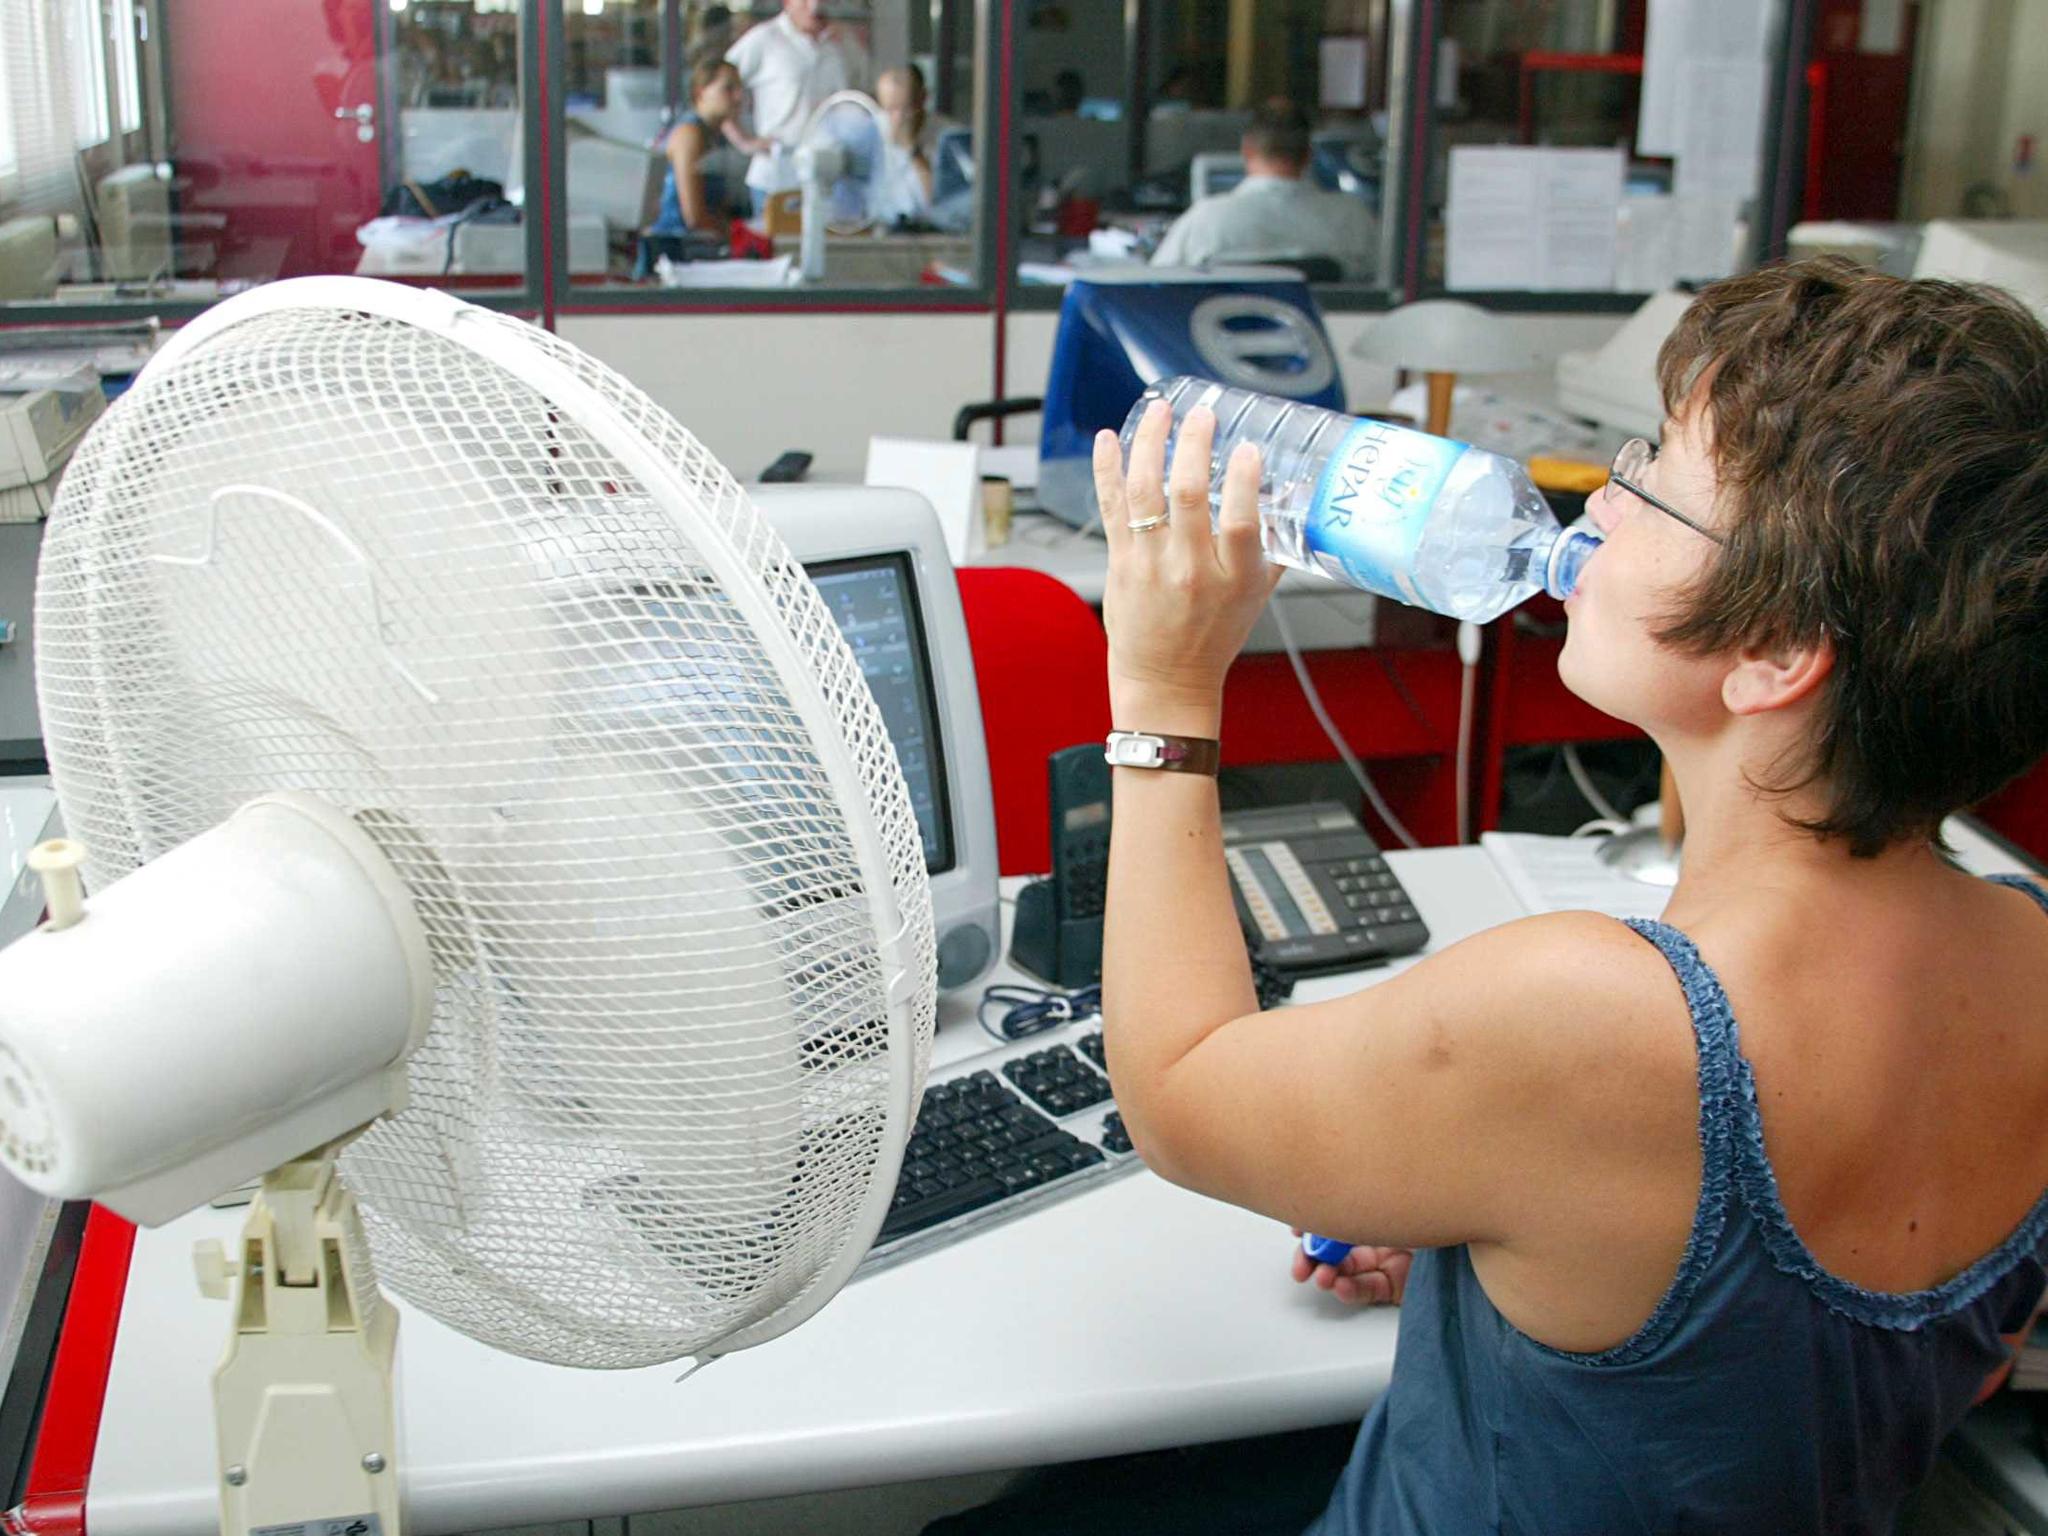 heat-office-etiquette